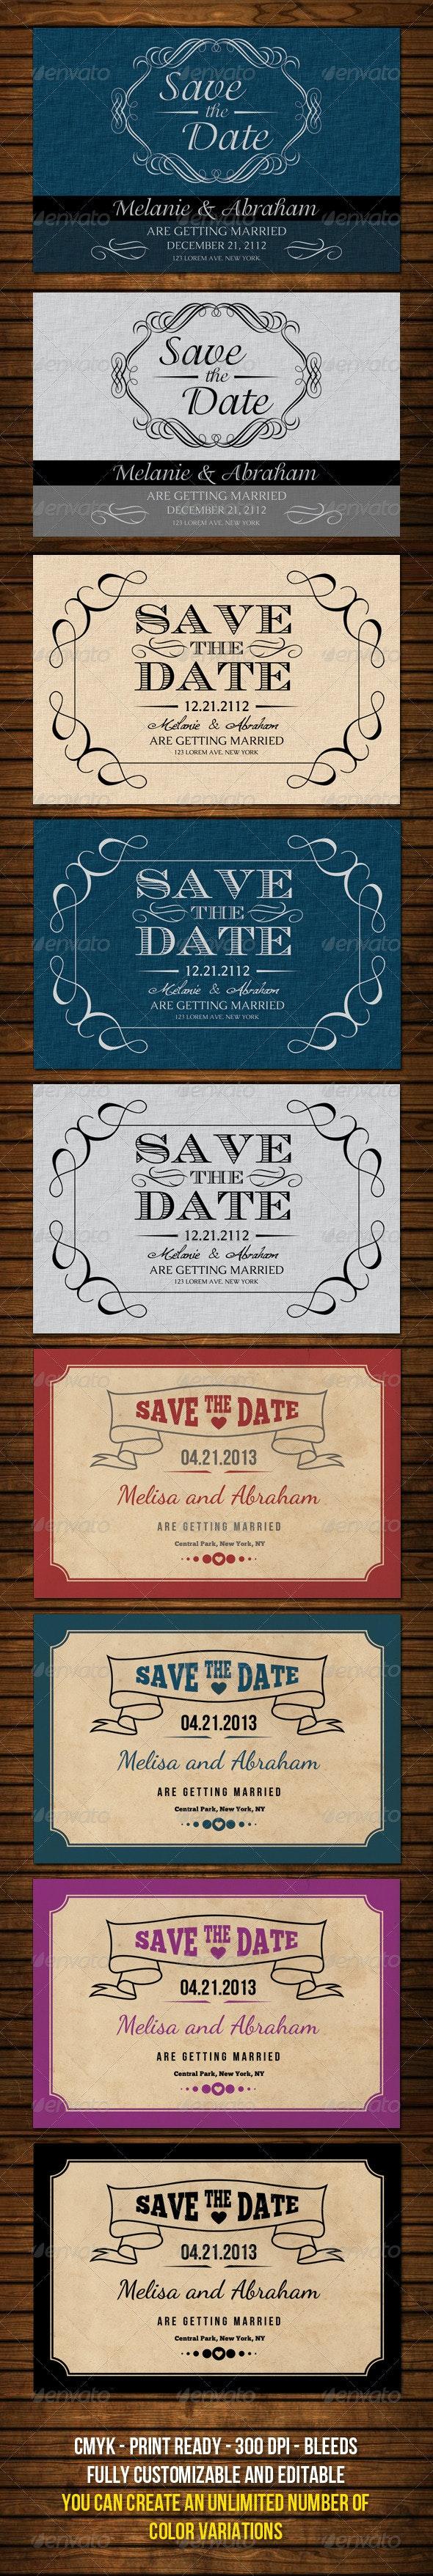 Wedding Cards Bundle v1 - Weddings Cards & Invites